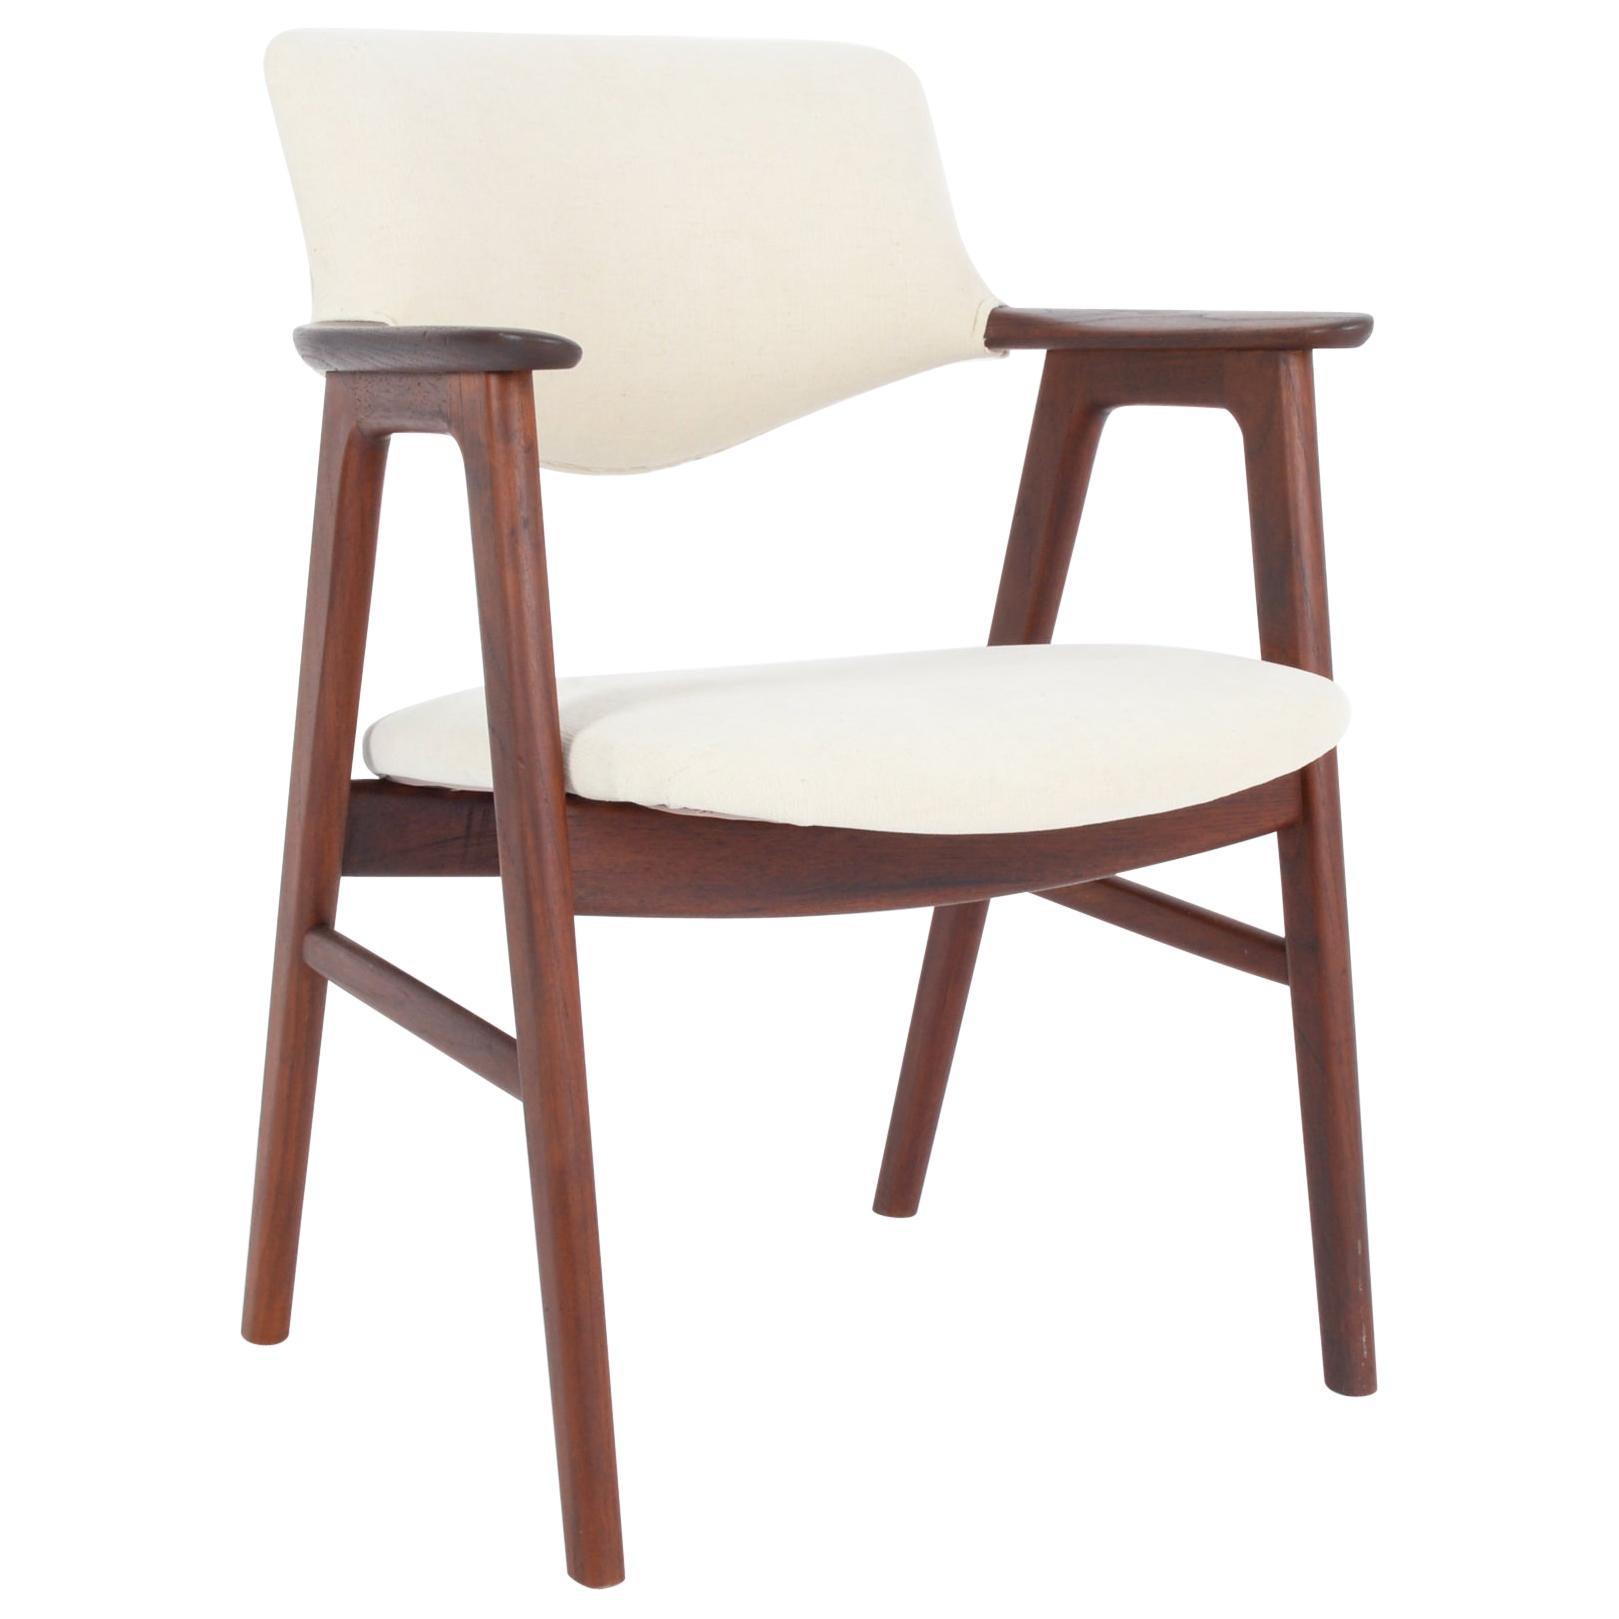 1960s Danish Modern Teak Accent Chair